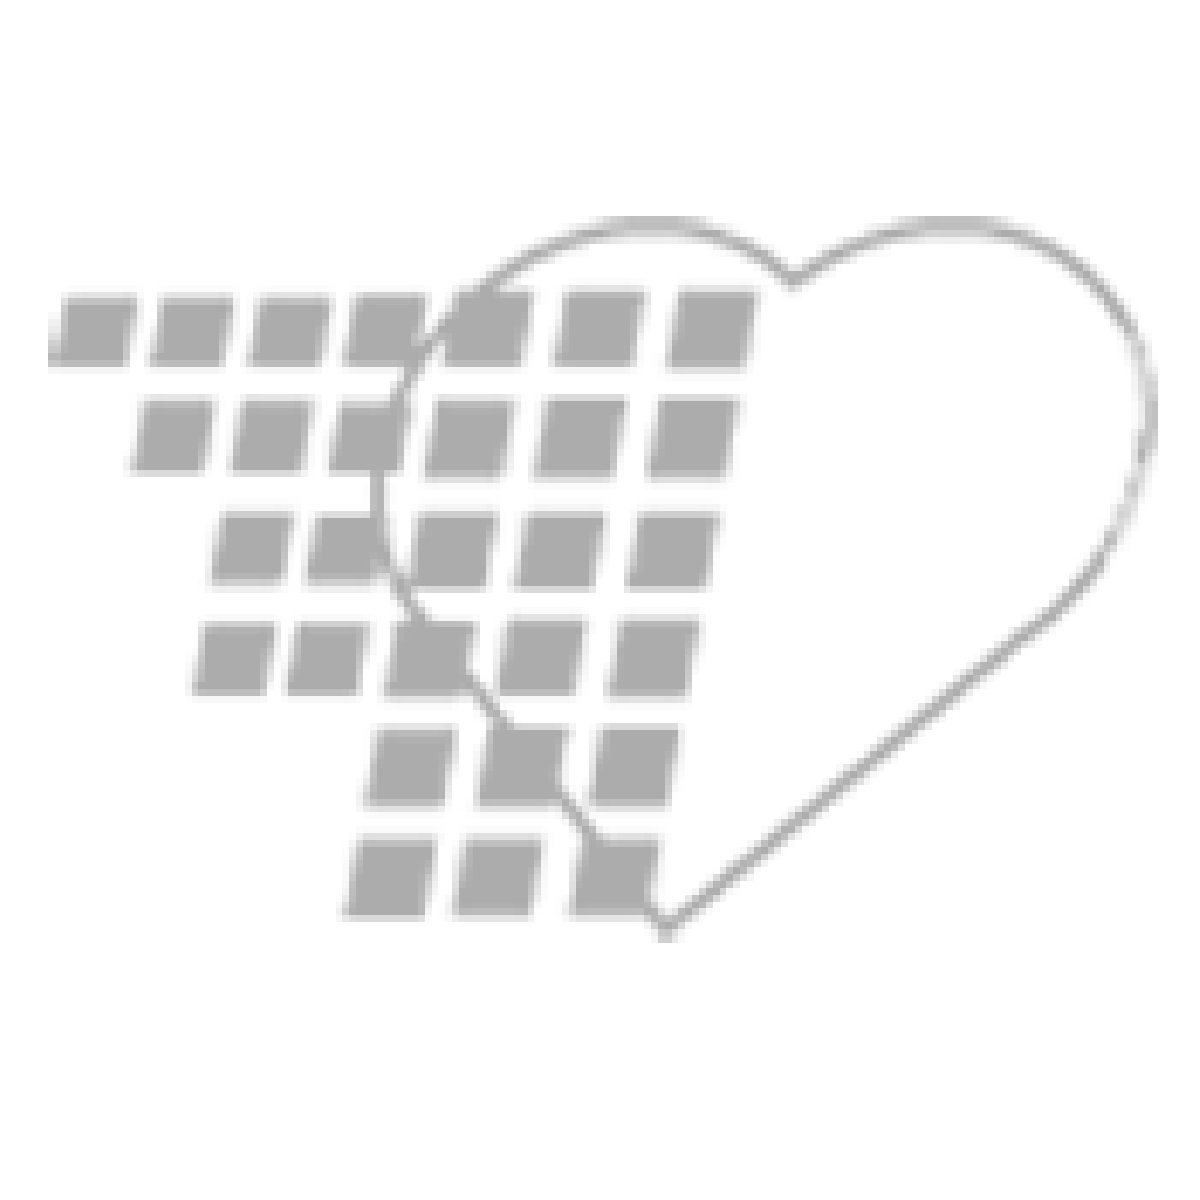 02-49-6415 - Hemoccult Sensa Rapid Diagnostic Test Kit Single Slides Fecal Occult Blood Test (FOB)